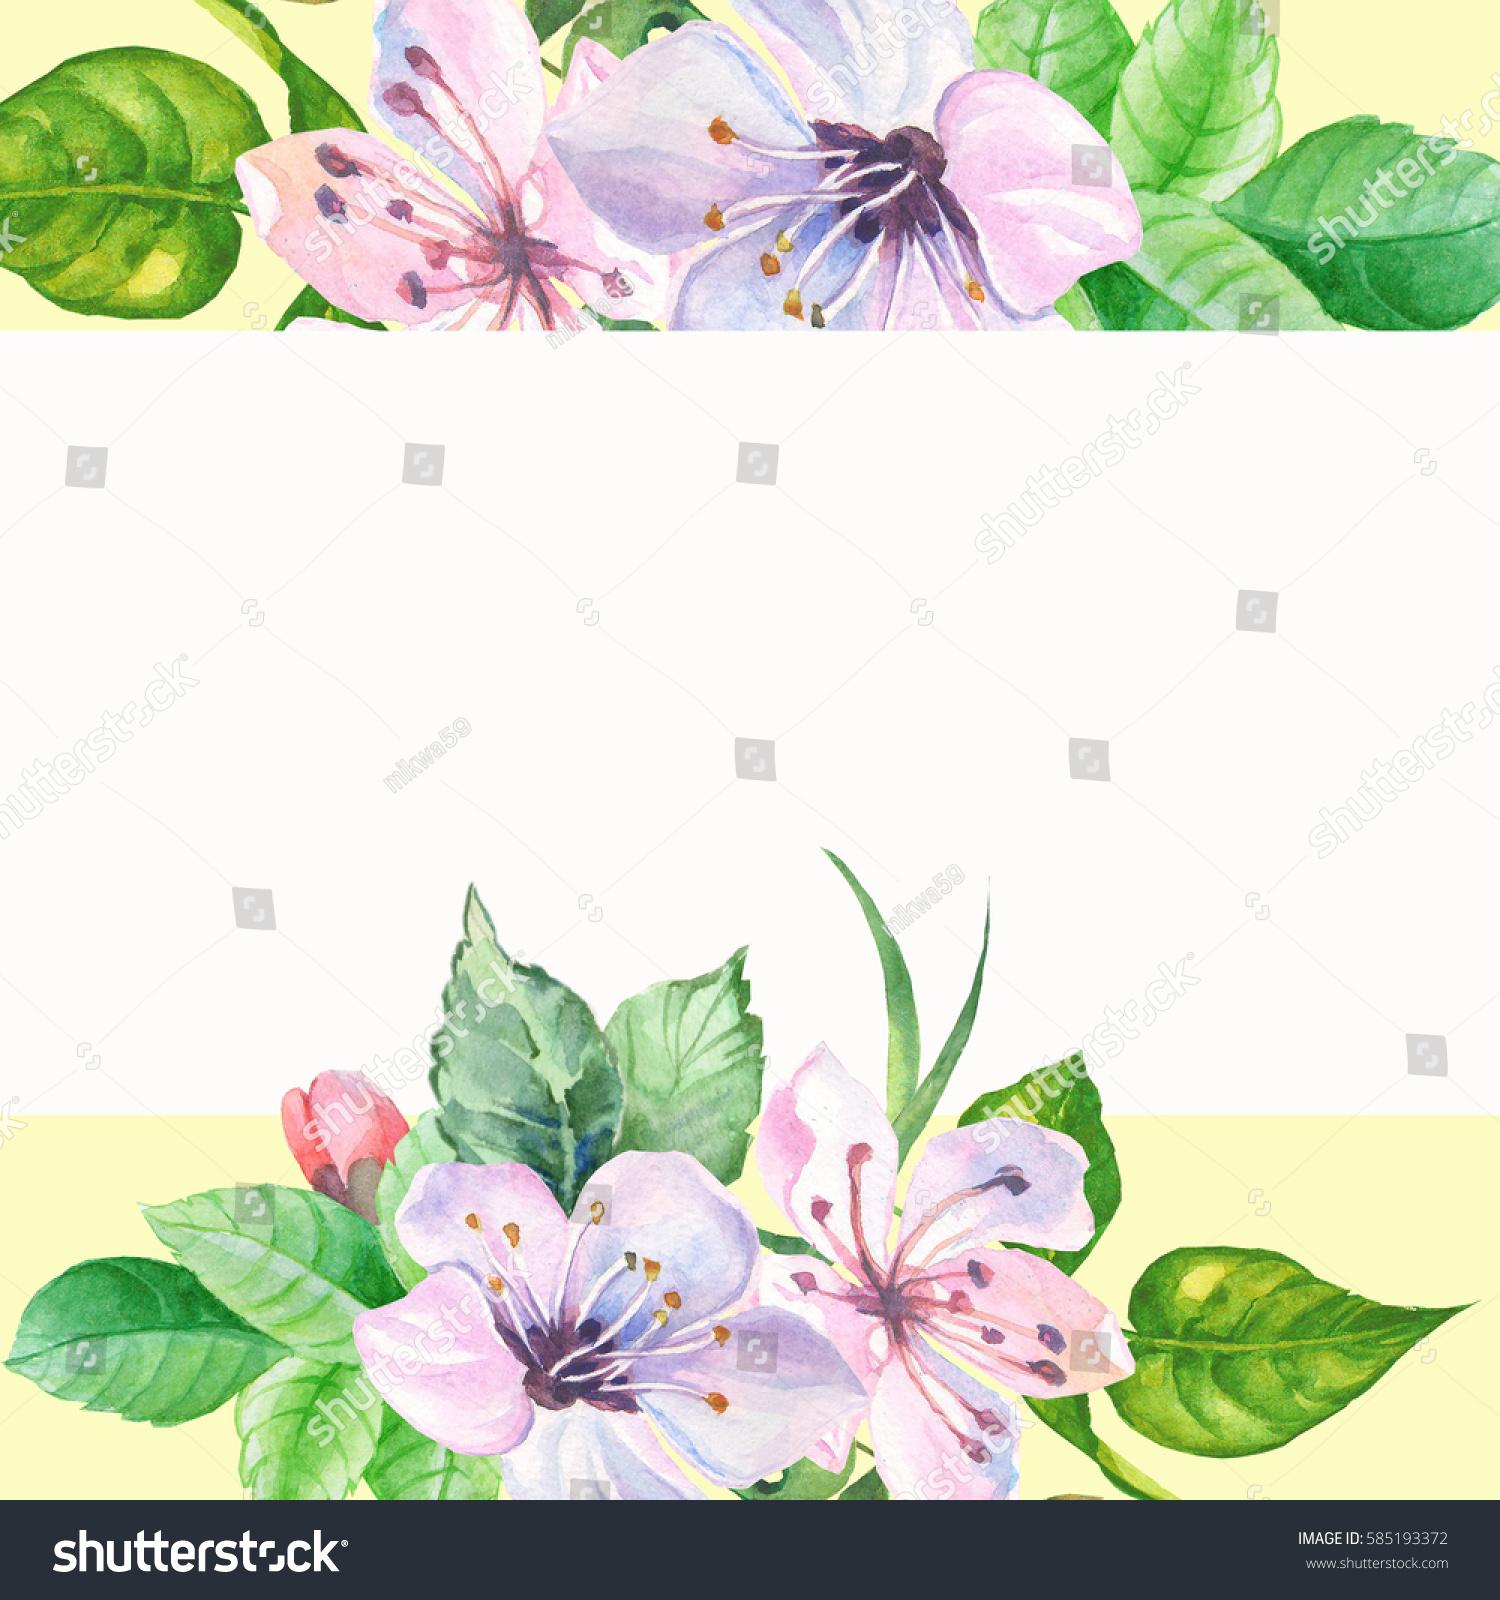 Watercolorspring flowers border ez canvas id 585193372 mightylinksfo